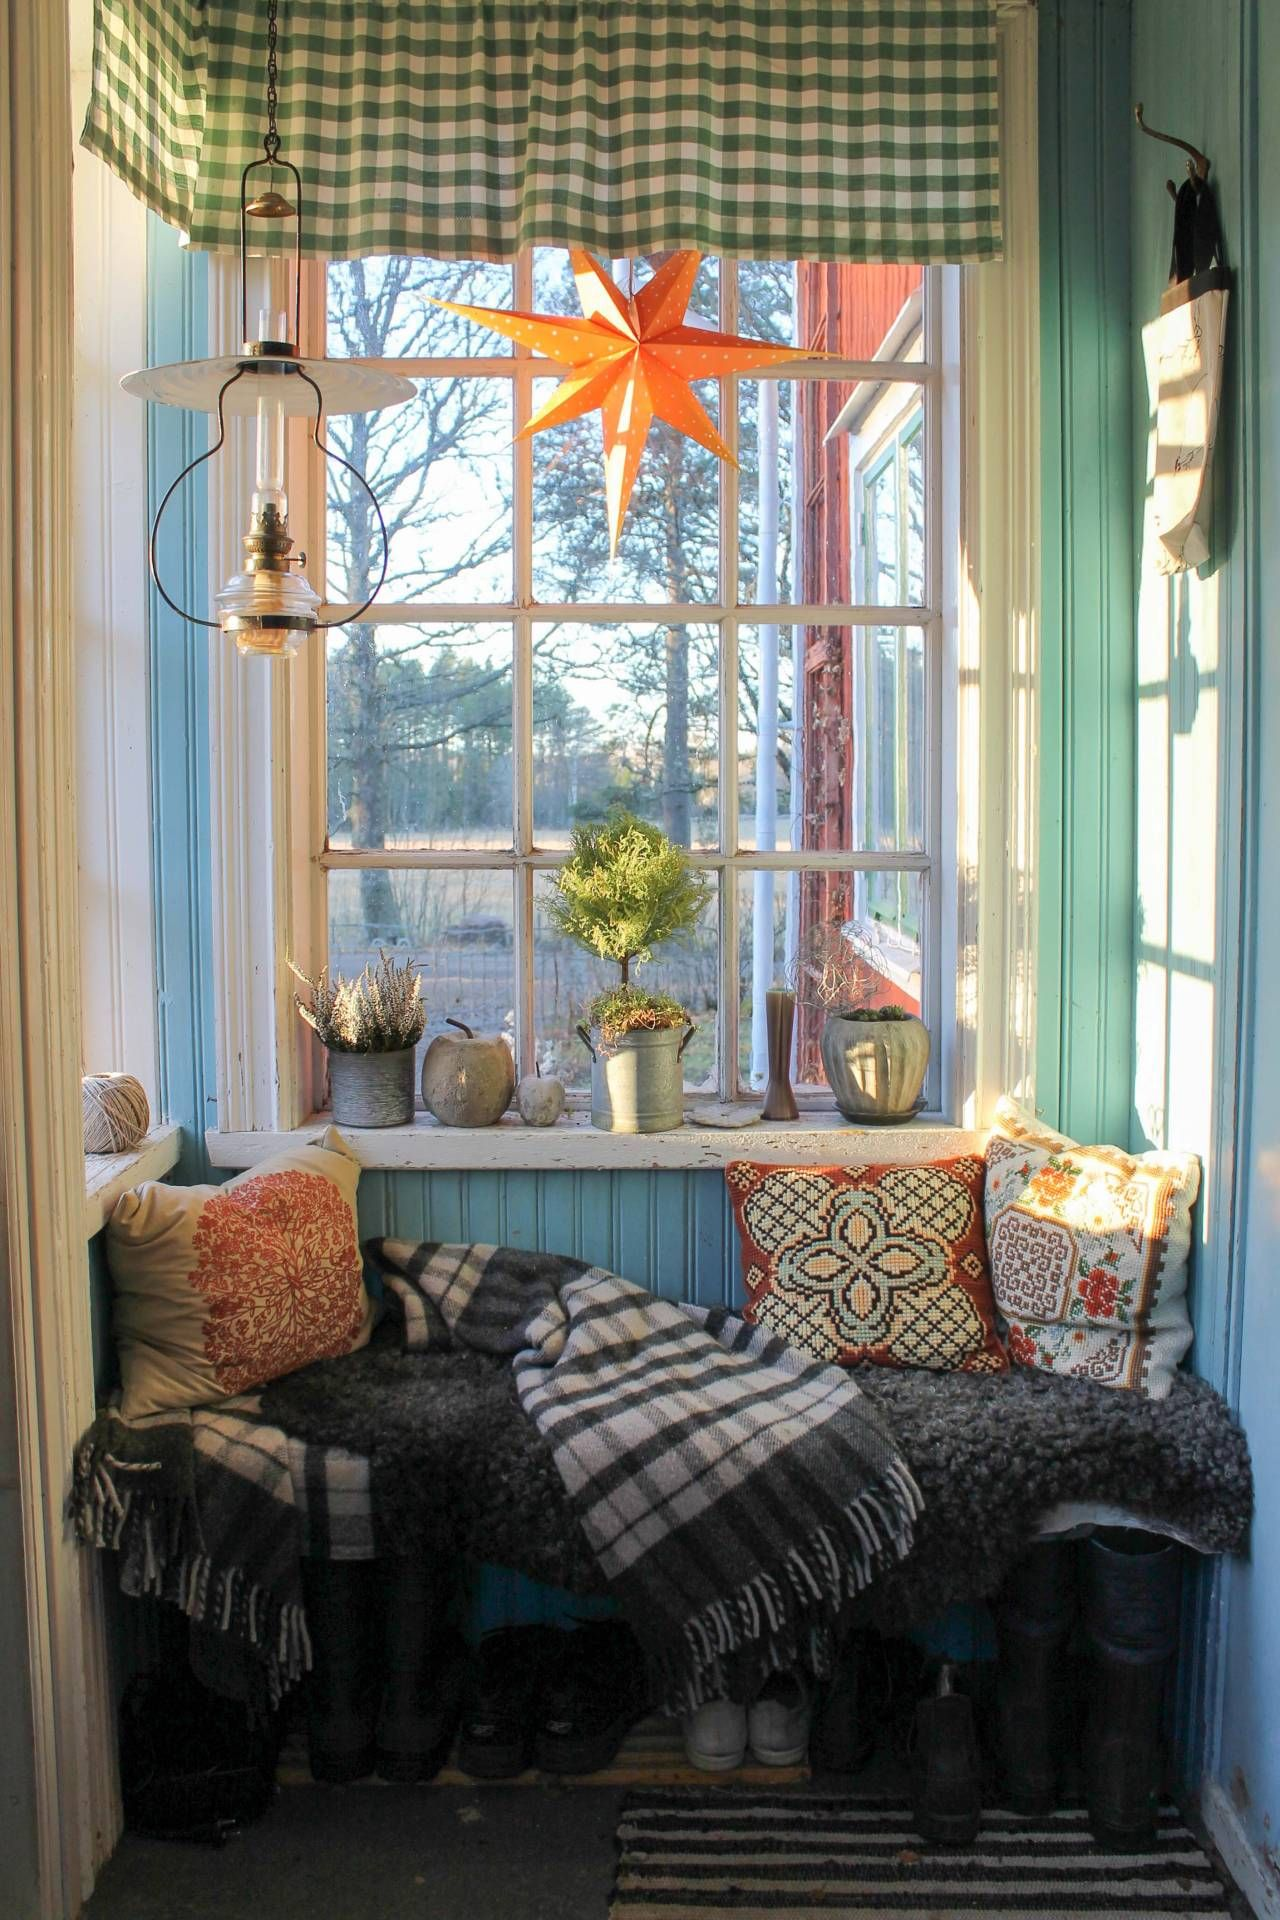 Kitchen nook window treatments  veranda med pärlspont foto erika Åberg  inne  pinterest